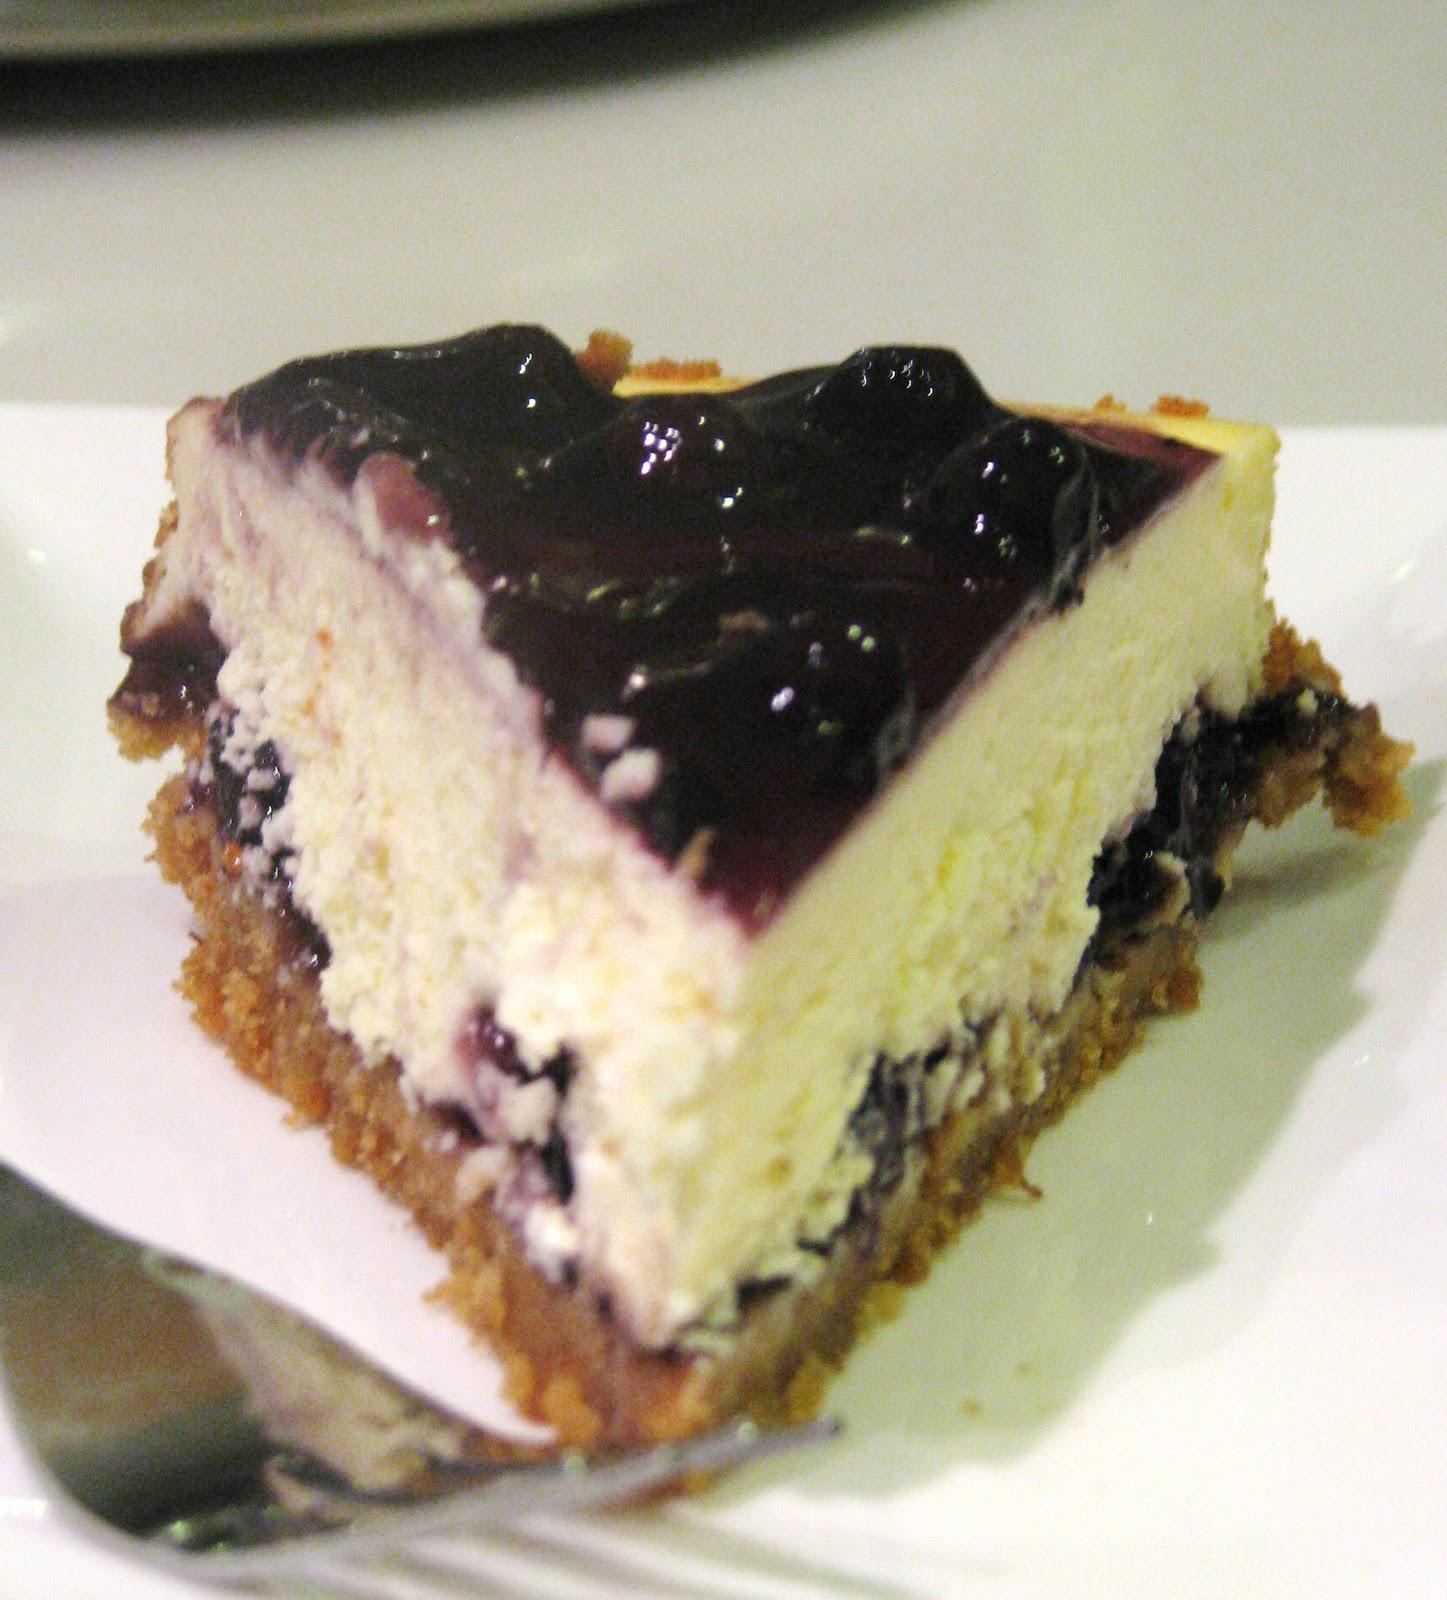 Blueberry Cheesecake - RM65 per cake